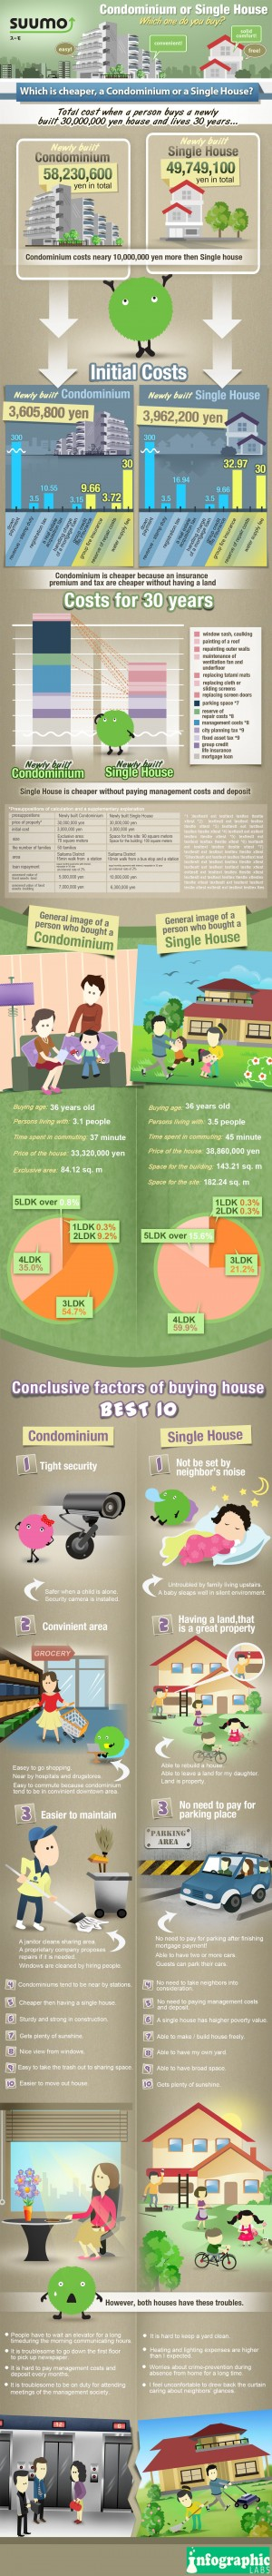 Condos vs. Houses